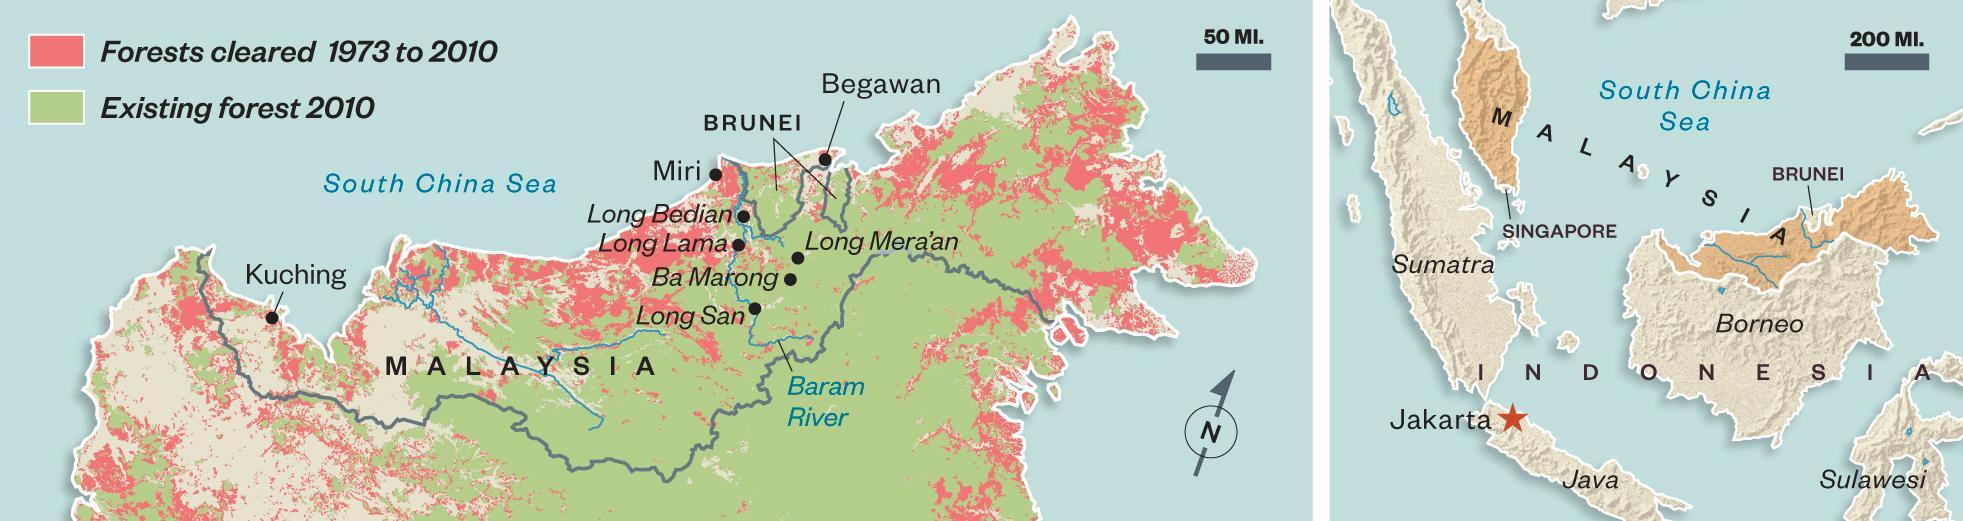 MAR2016_H99_Borneo.jpg